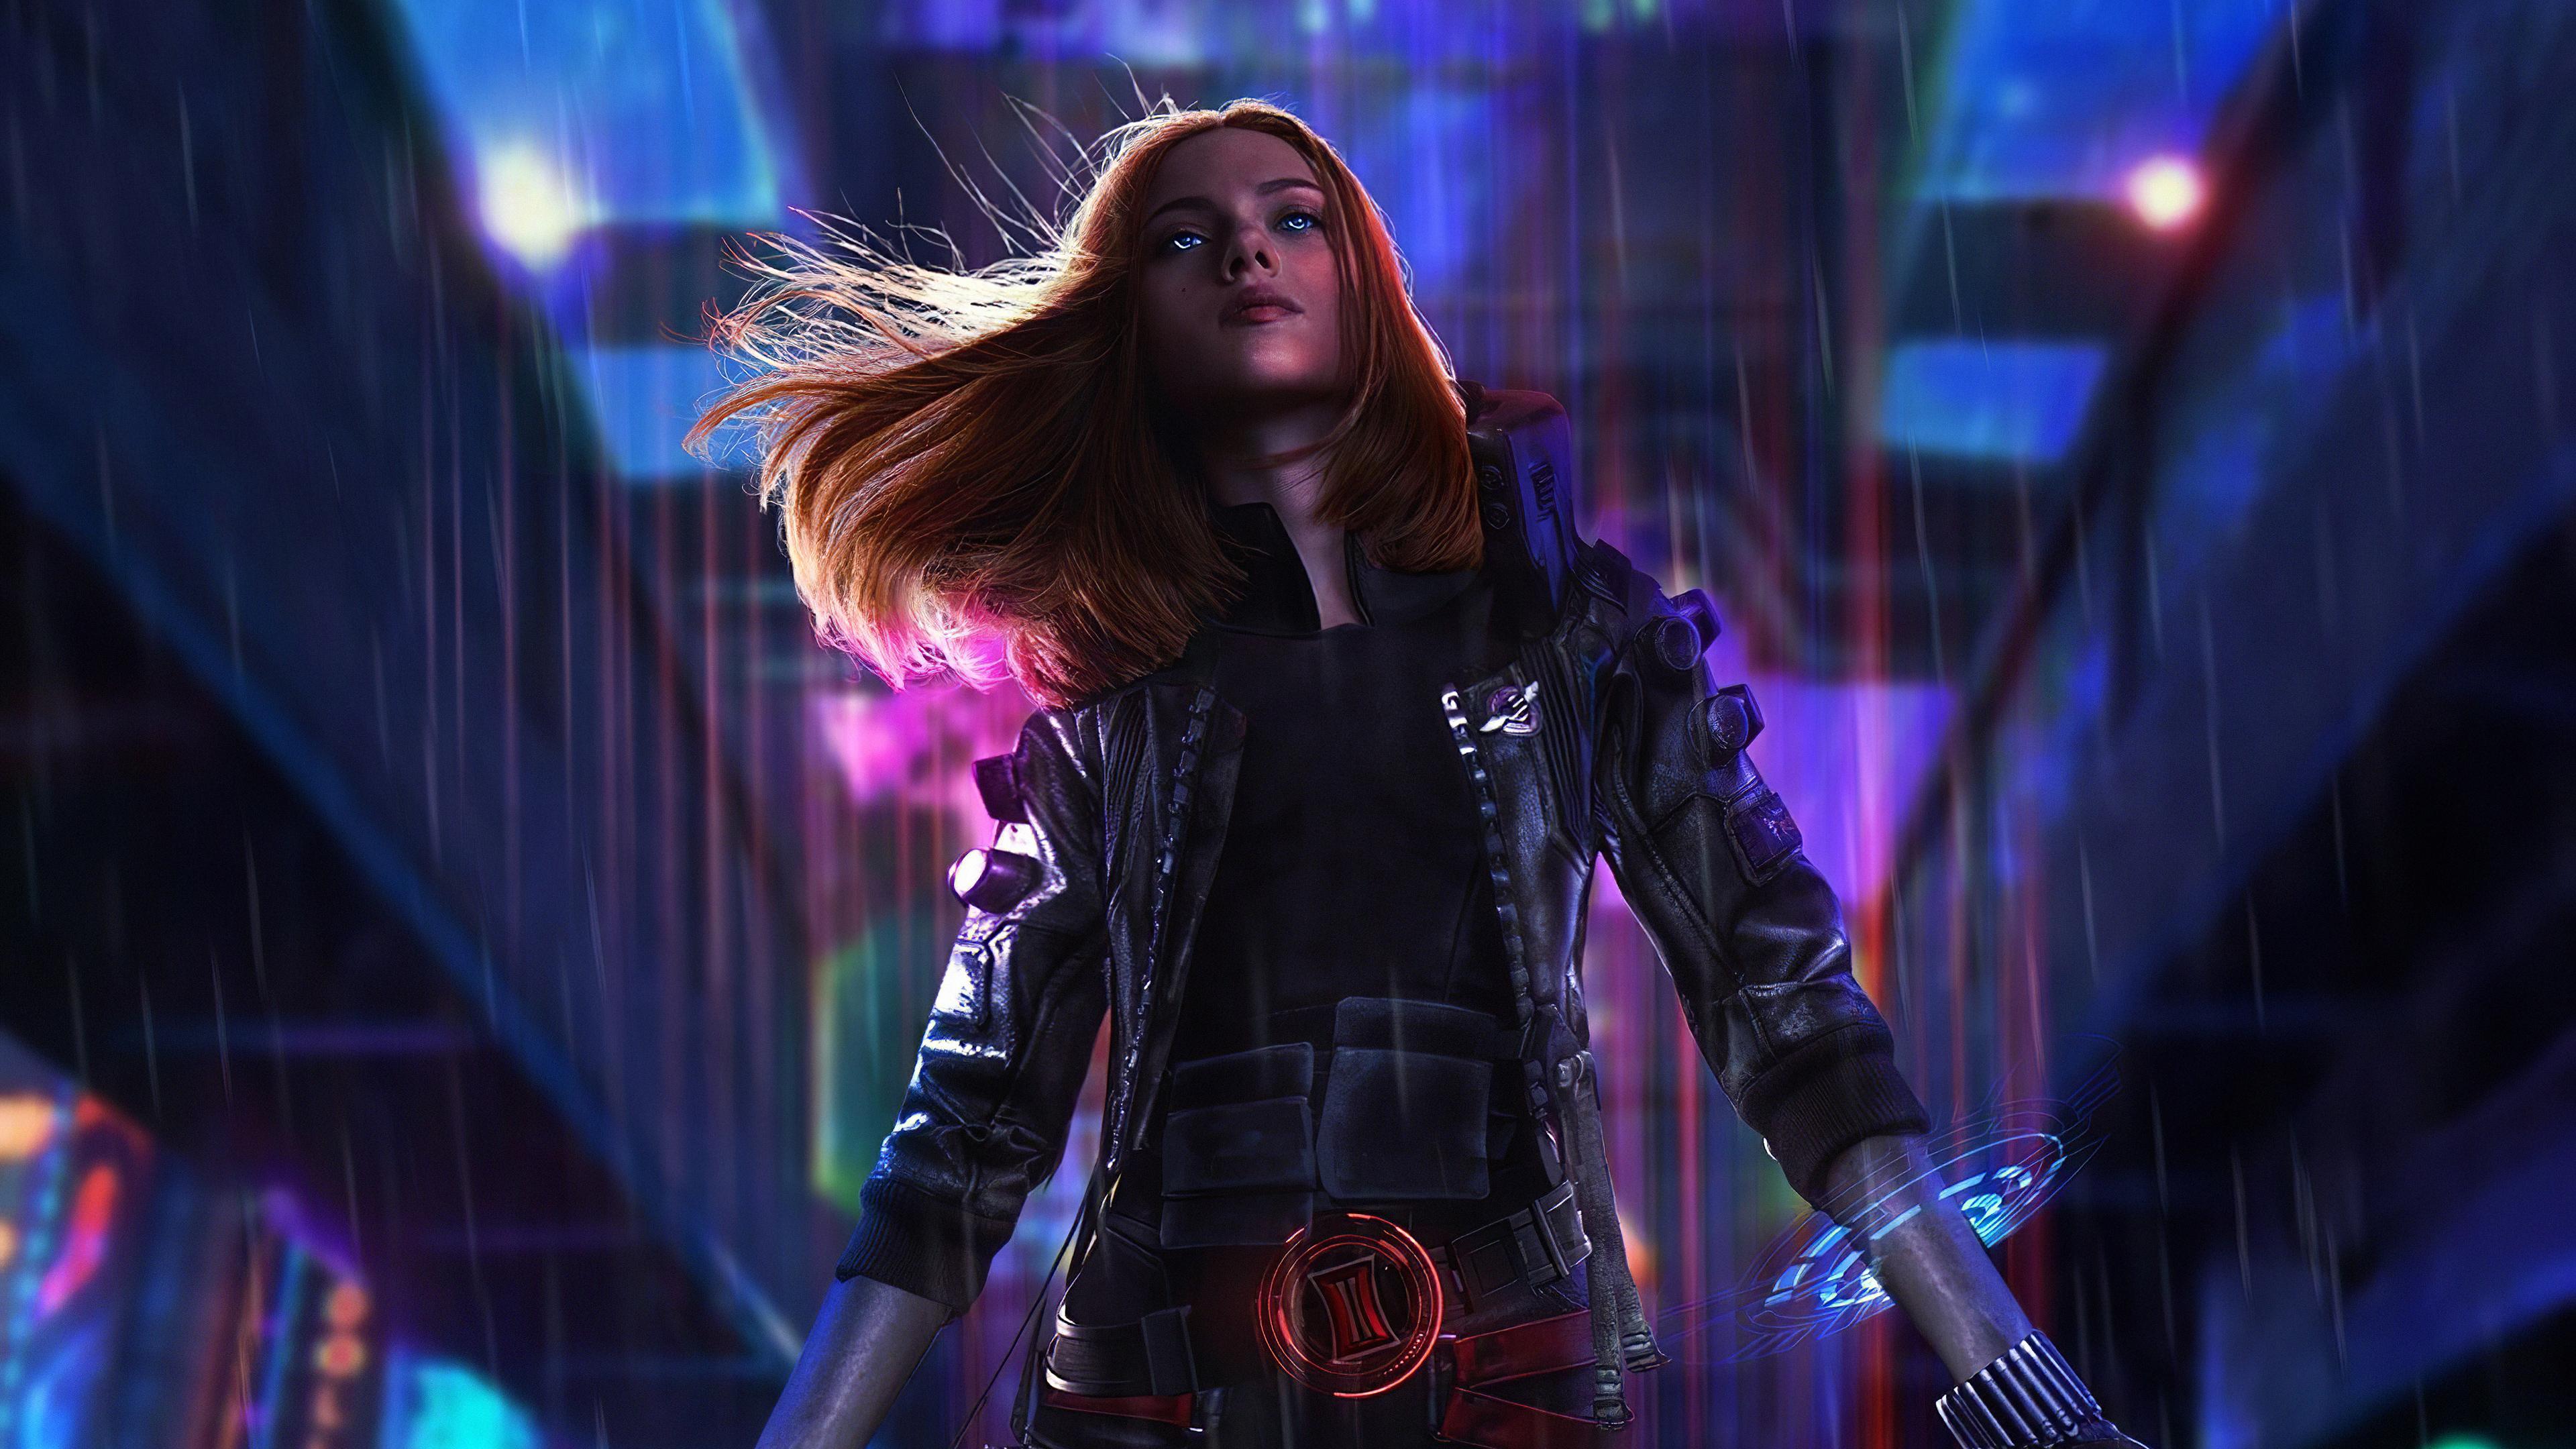 cyberpunk black widow 1572368592 - Cyberpunk Black Widow - superheroes wallpapers, hd-wallpapers, cyberpunk wallpapers, black widow wallpapers, artwork wallpapers, artstation wallpapers, 4k-wallpapers